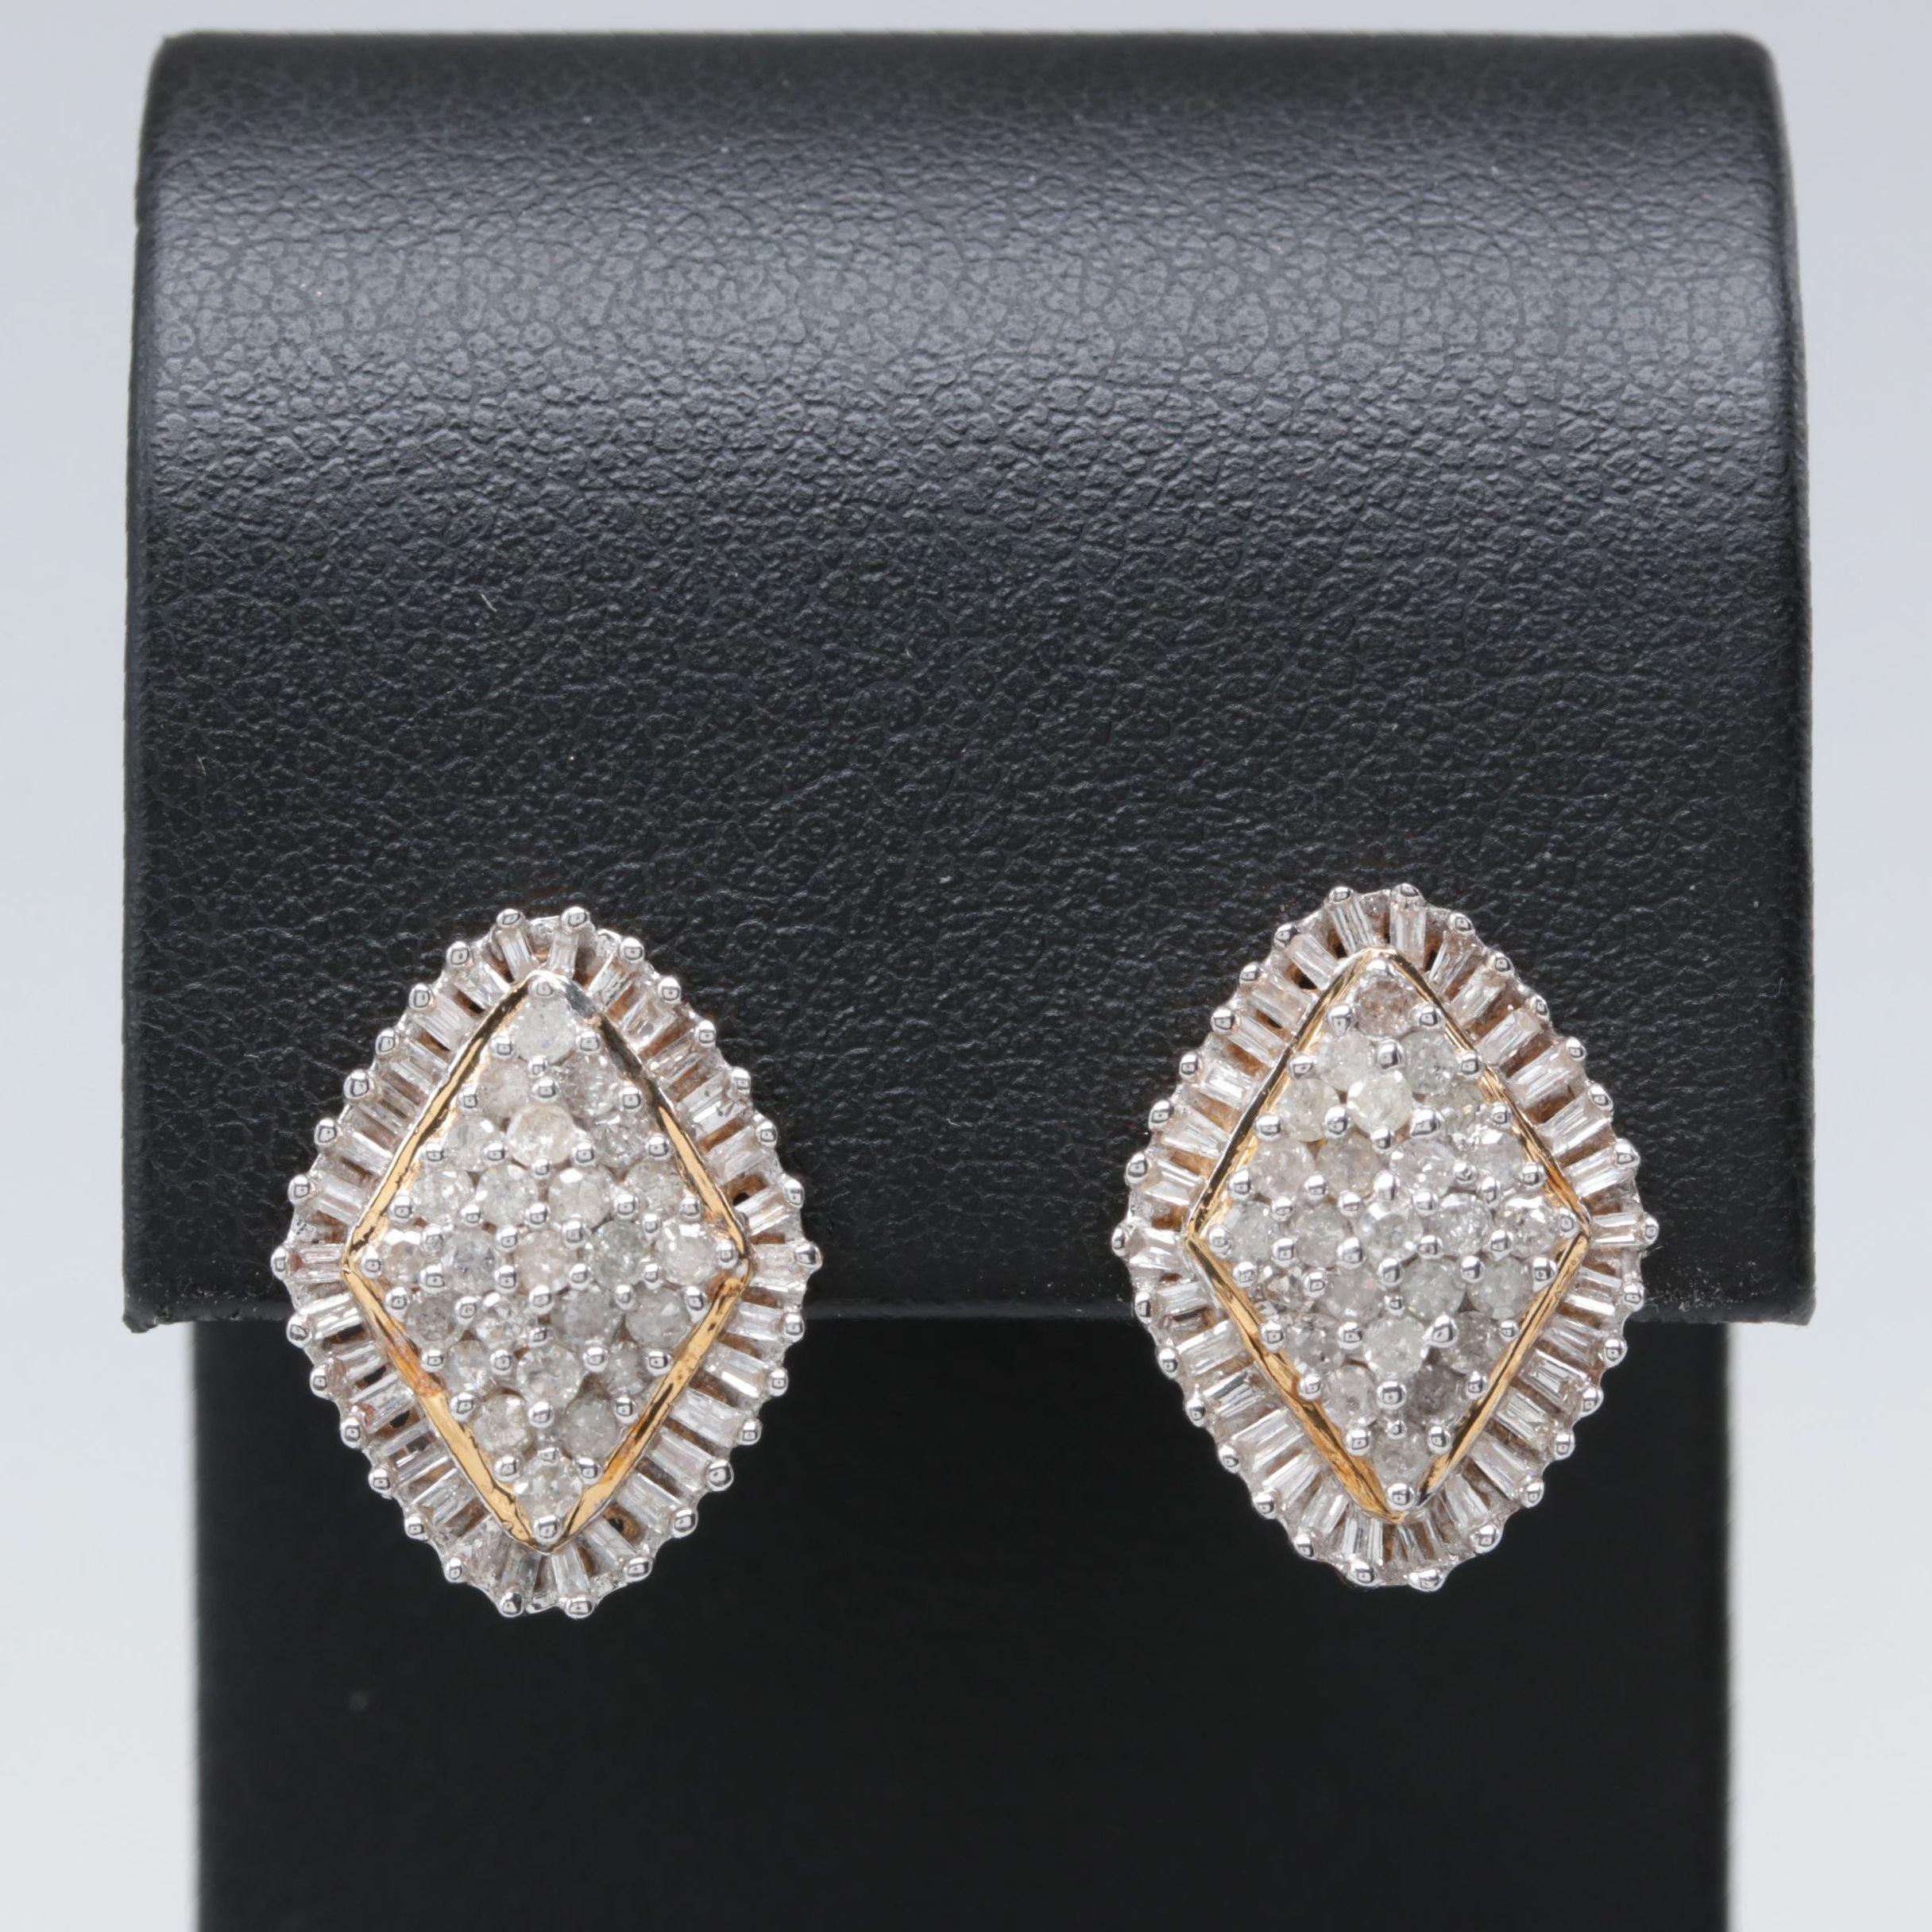 10K Yellow Gold 1.10 CTW Diamond Earrings